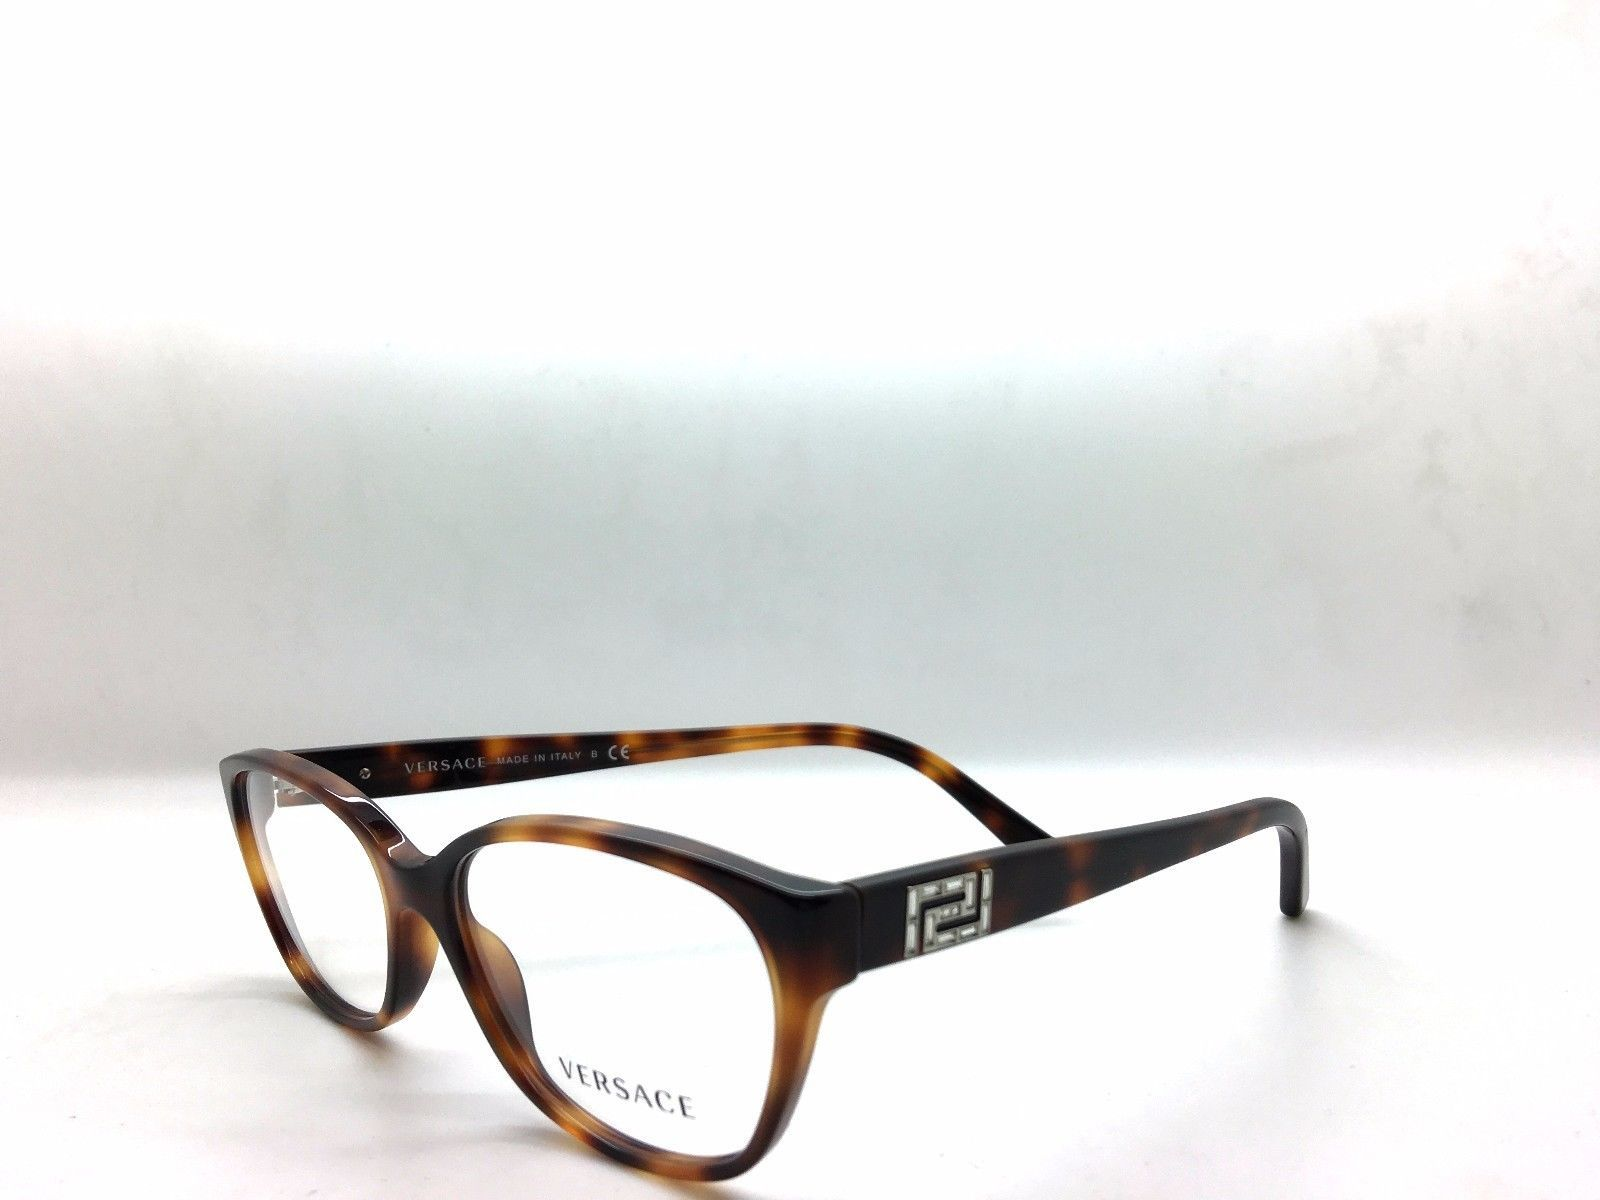 848b4d7e3552 Versace Mod 3189-B 5061 Eyewear Frames and 50 similar items. 57